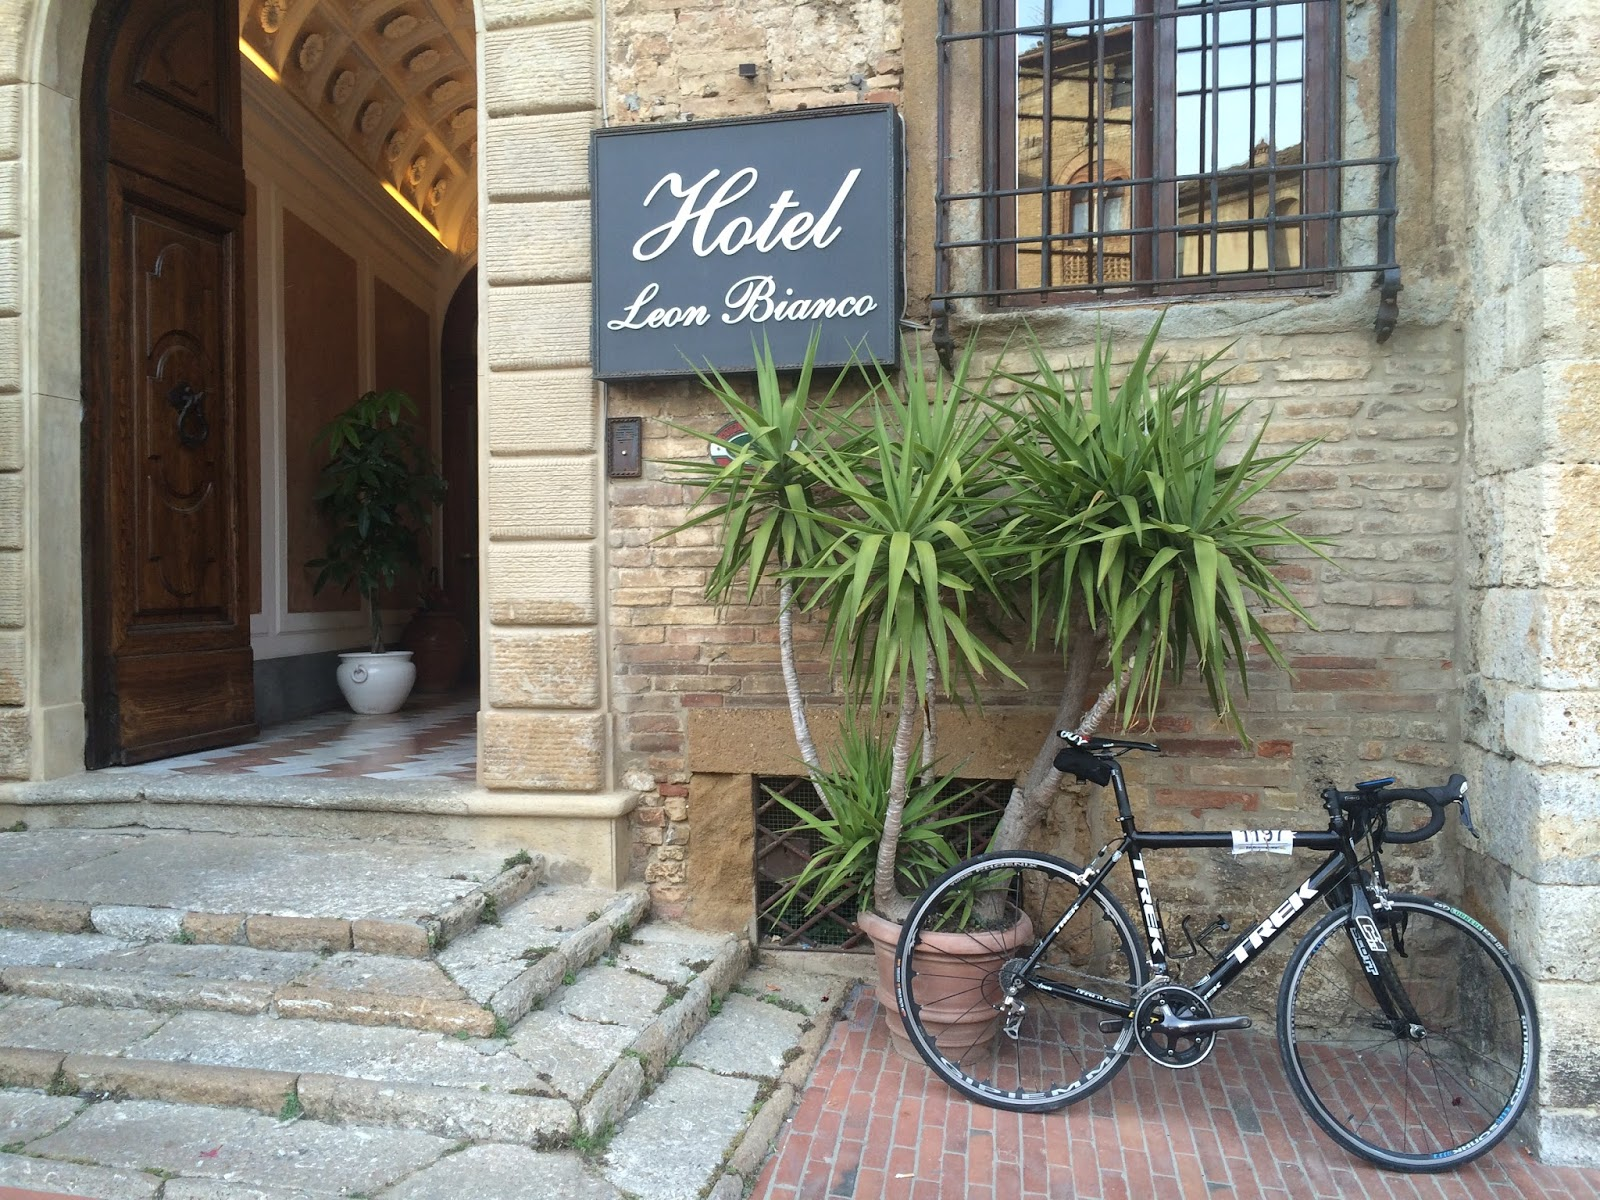 Hotel Leon Bianco Venezia